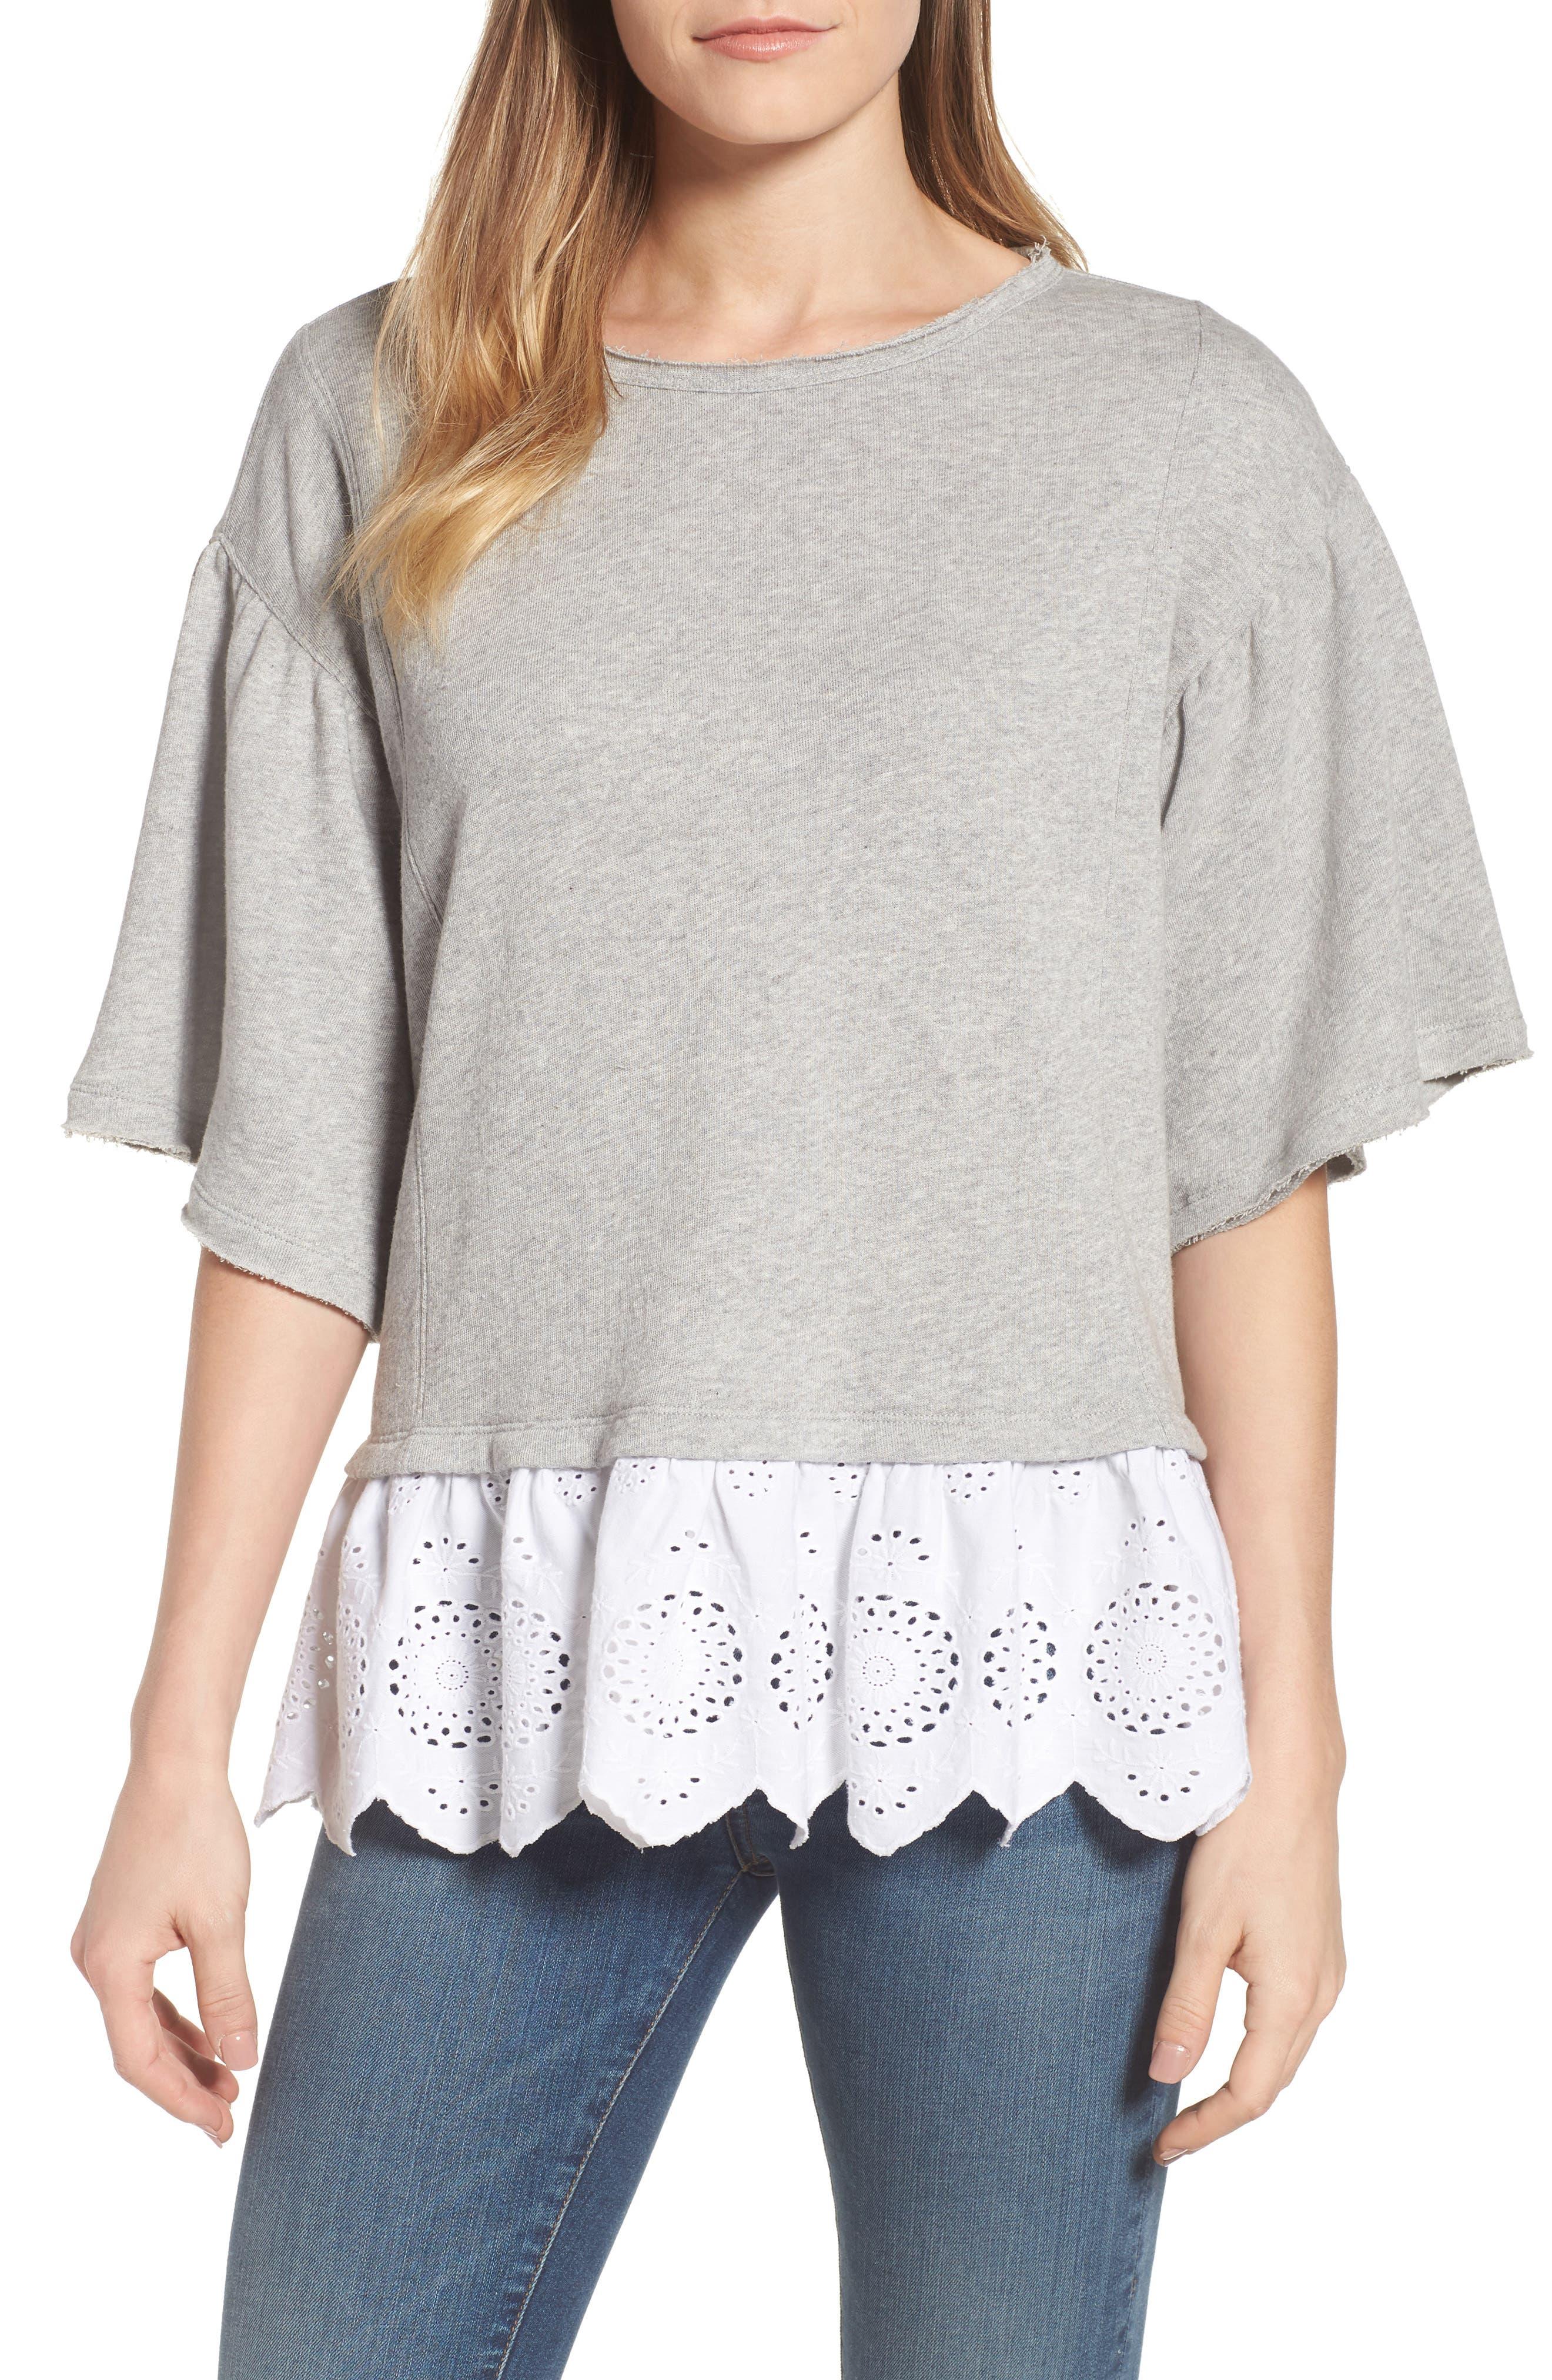 Twofer Sweatshirt,                         Main,                         color, 050